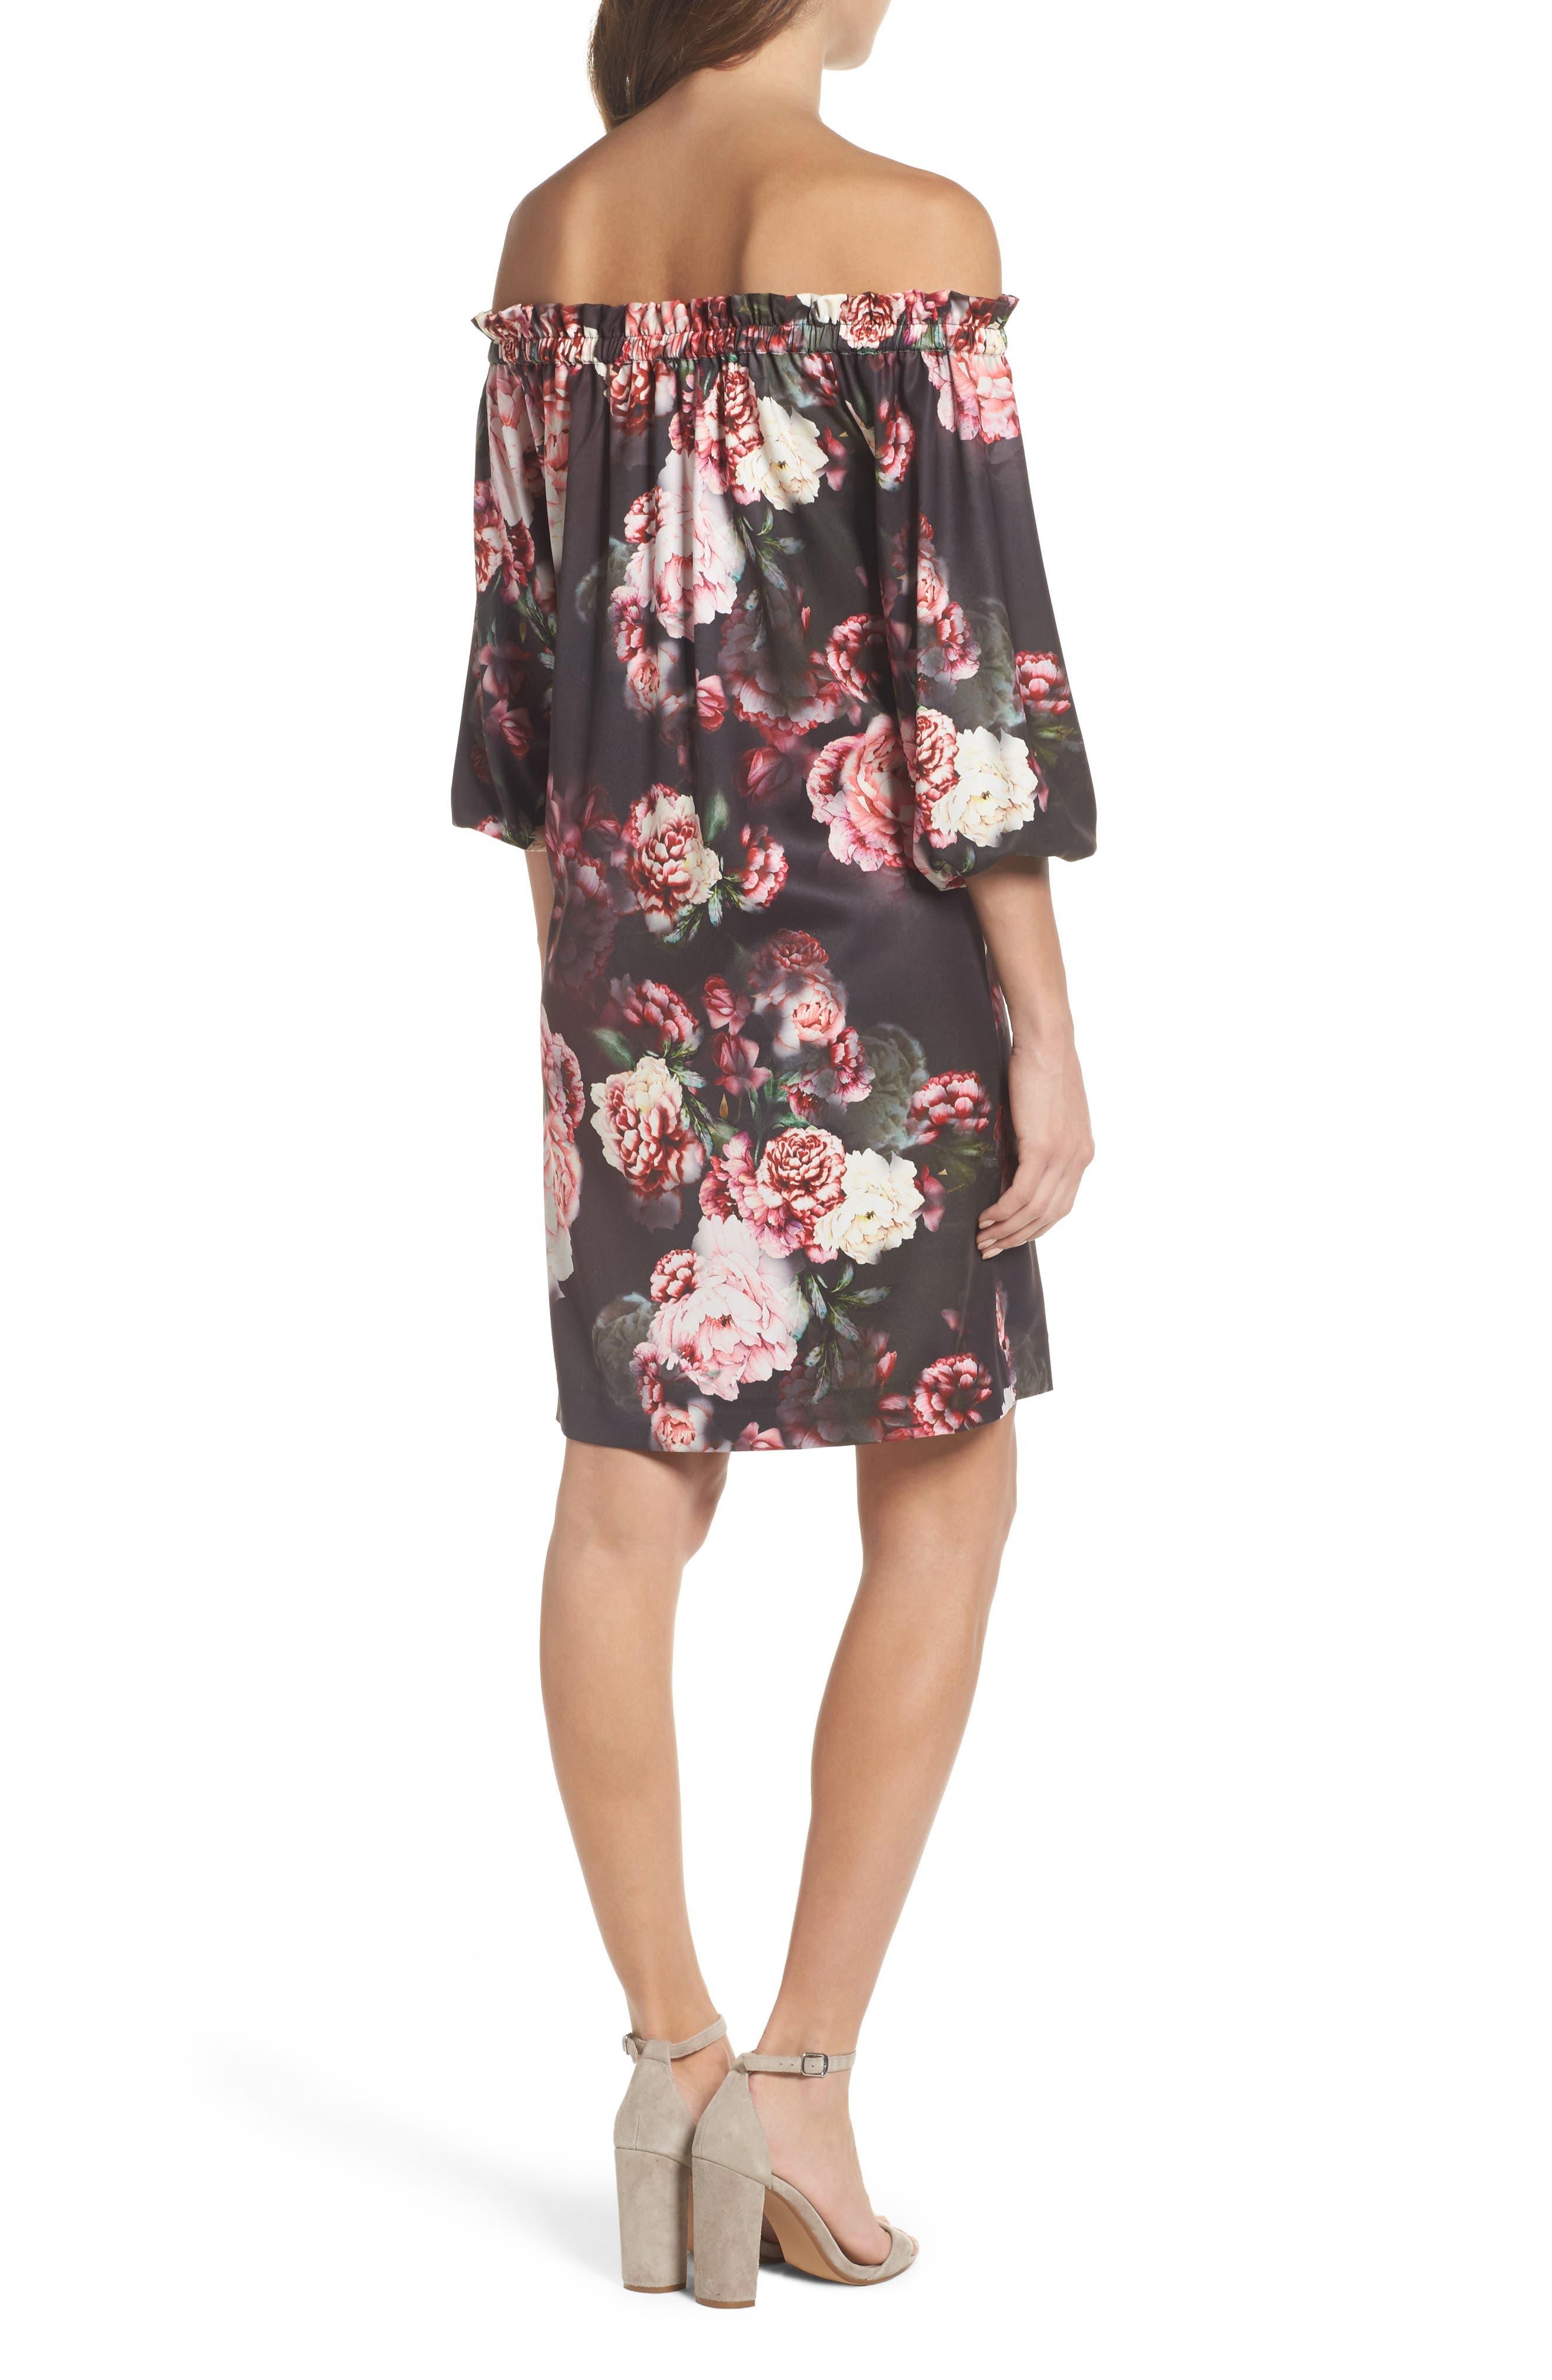 Alternate Image 2  - Felicity & Coco Print Off the Shoulder Shift Dress (Regular & Petite) (Nordstrom Exclusive)